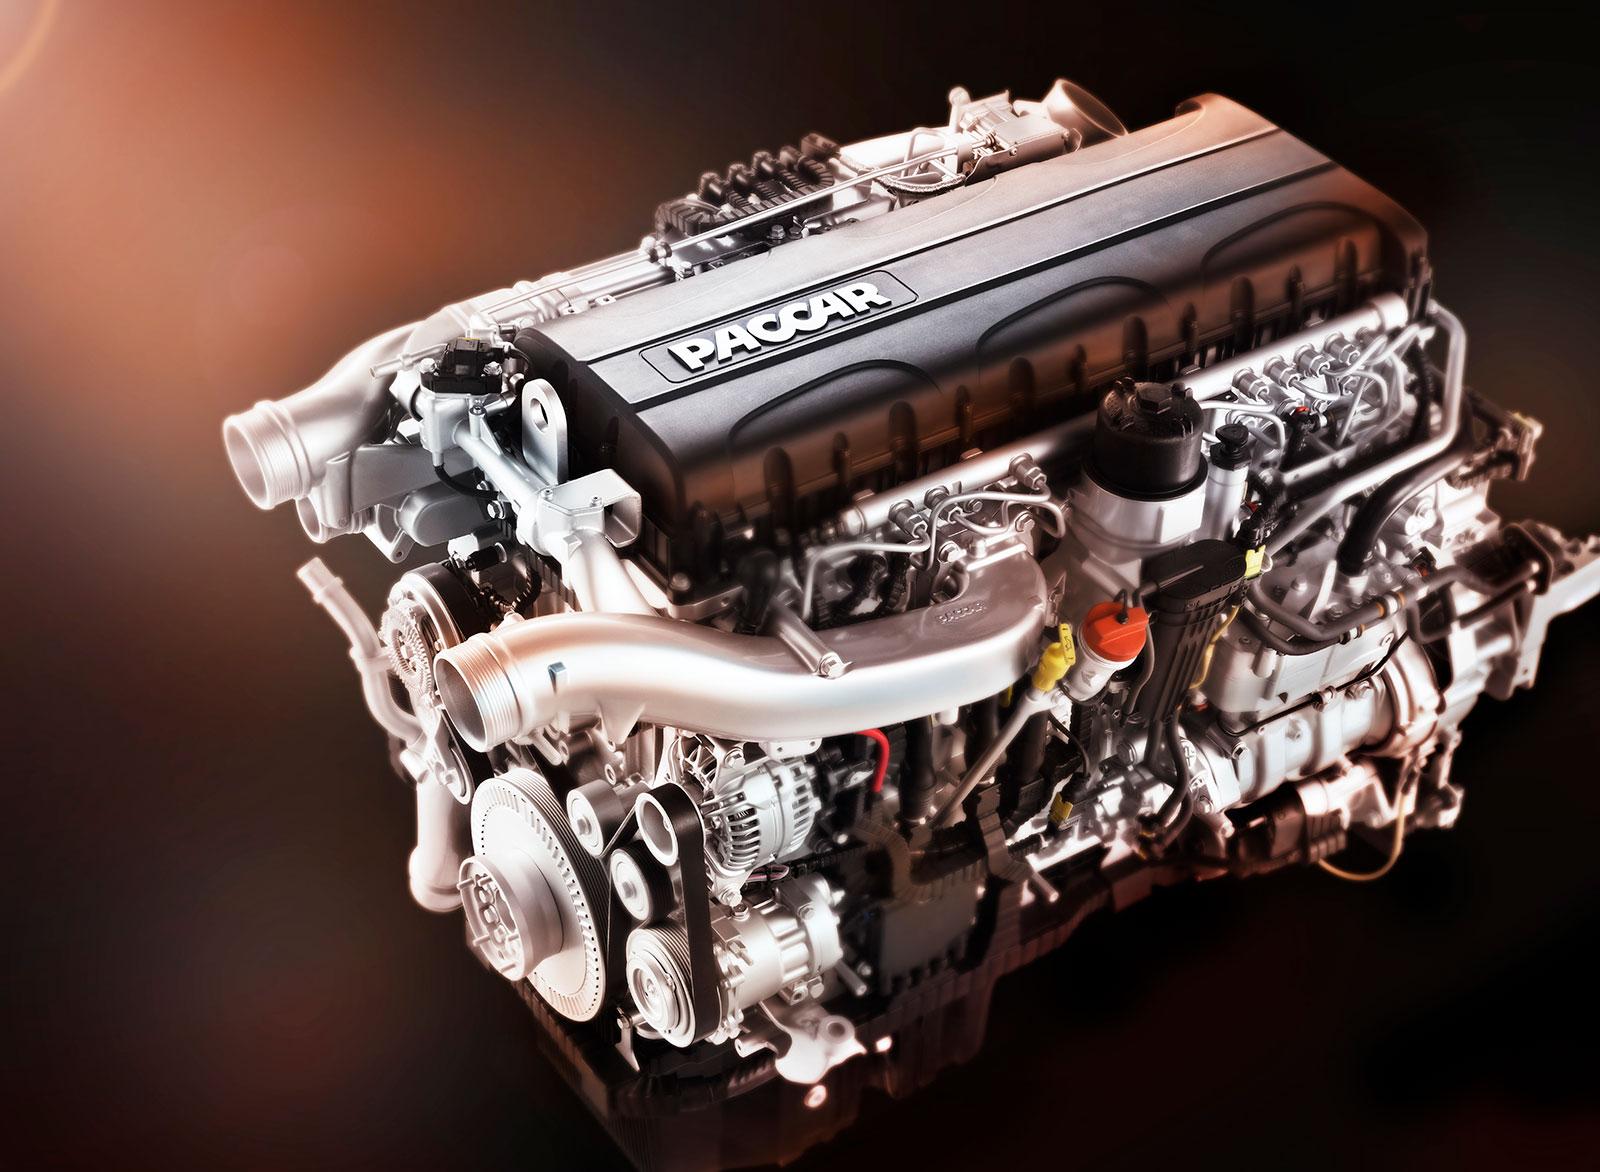 paccar-mx-11-euro-6-engine-01